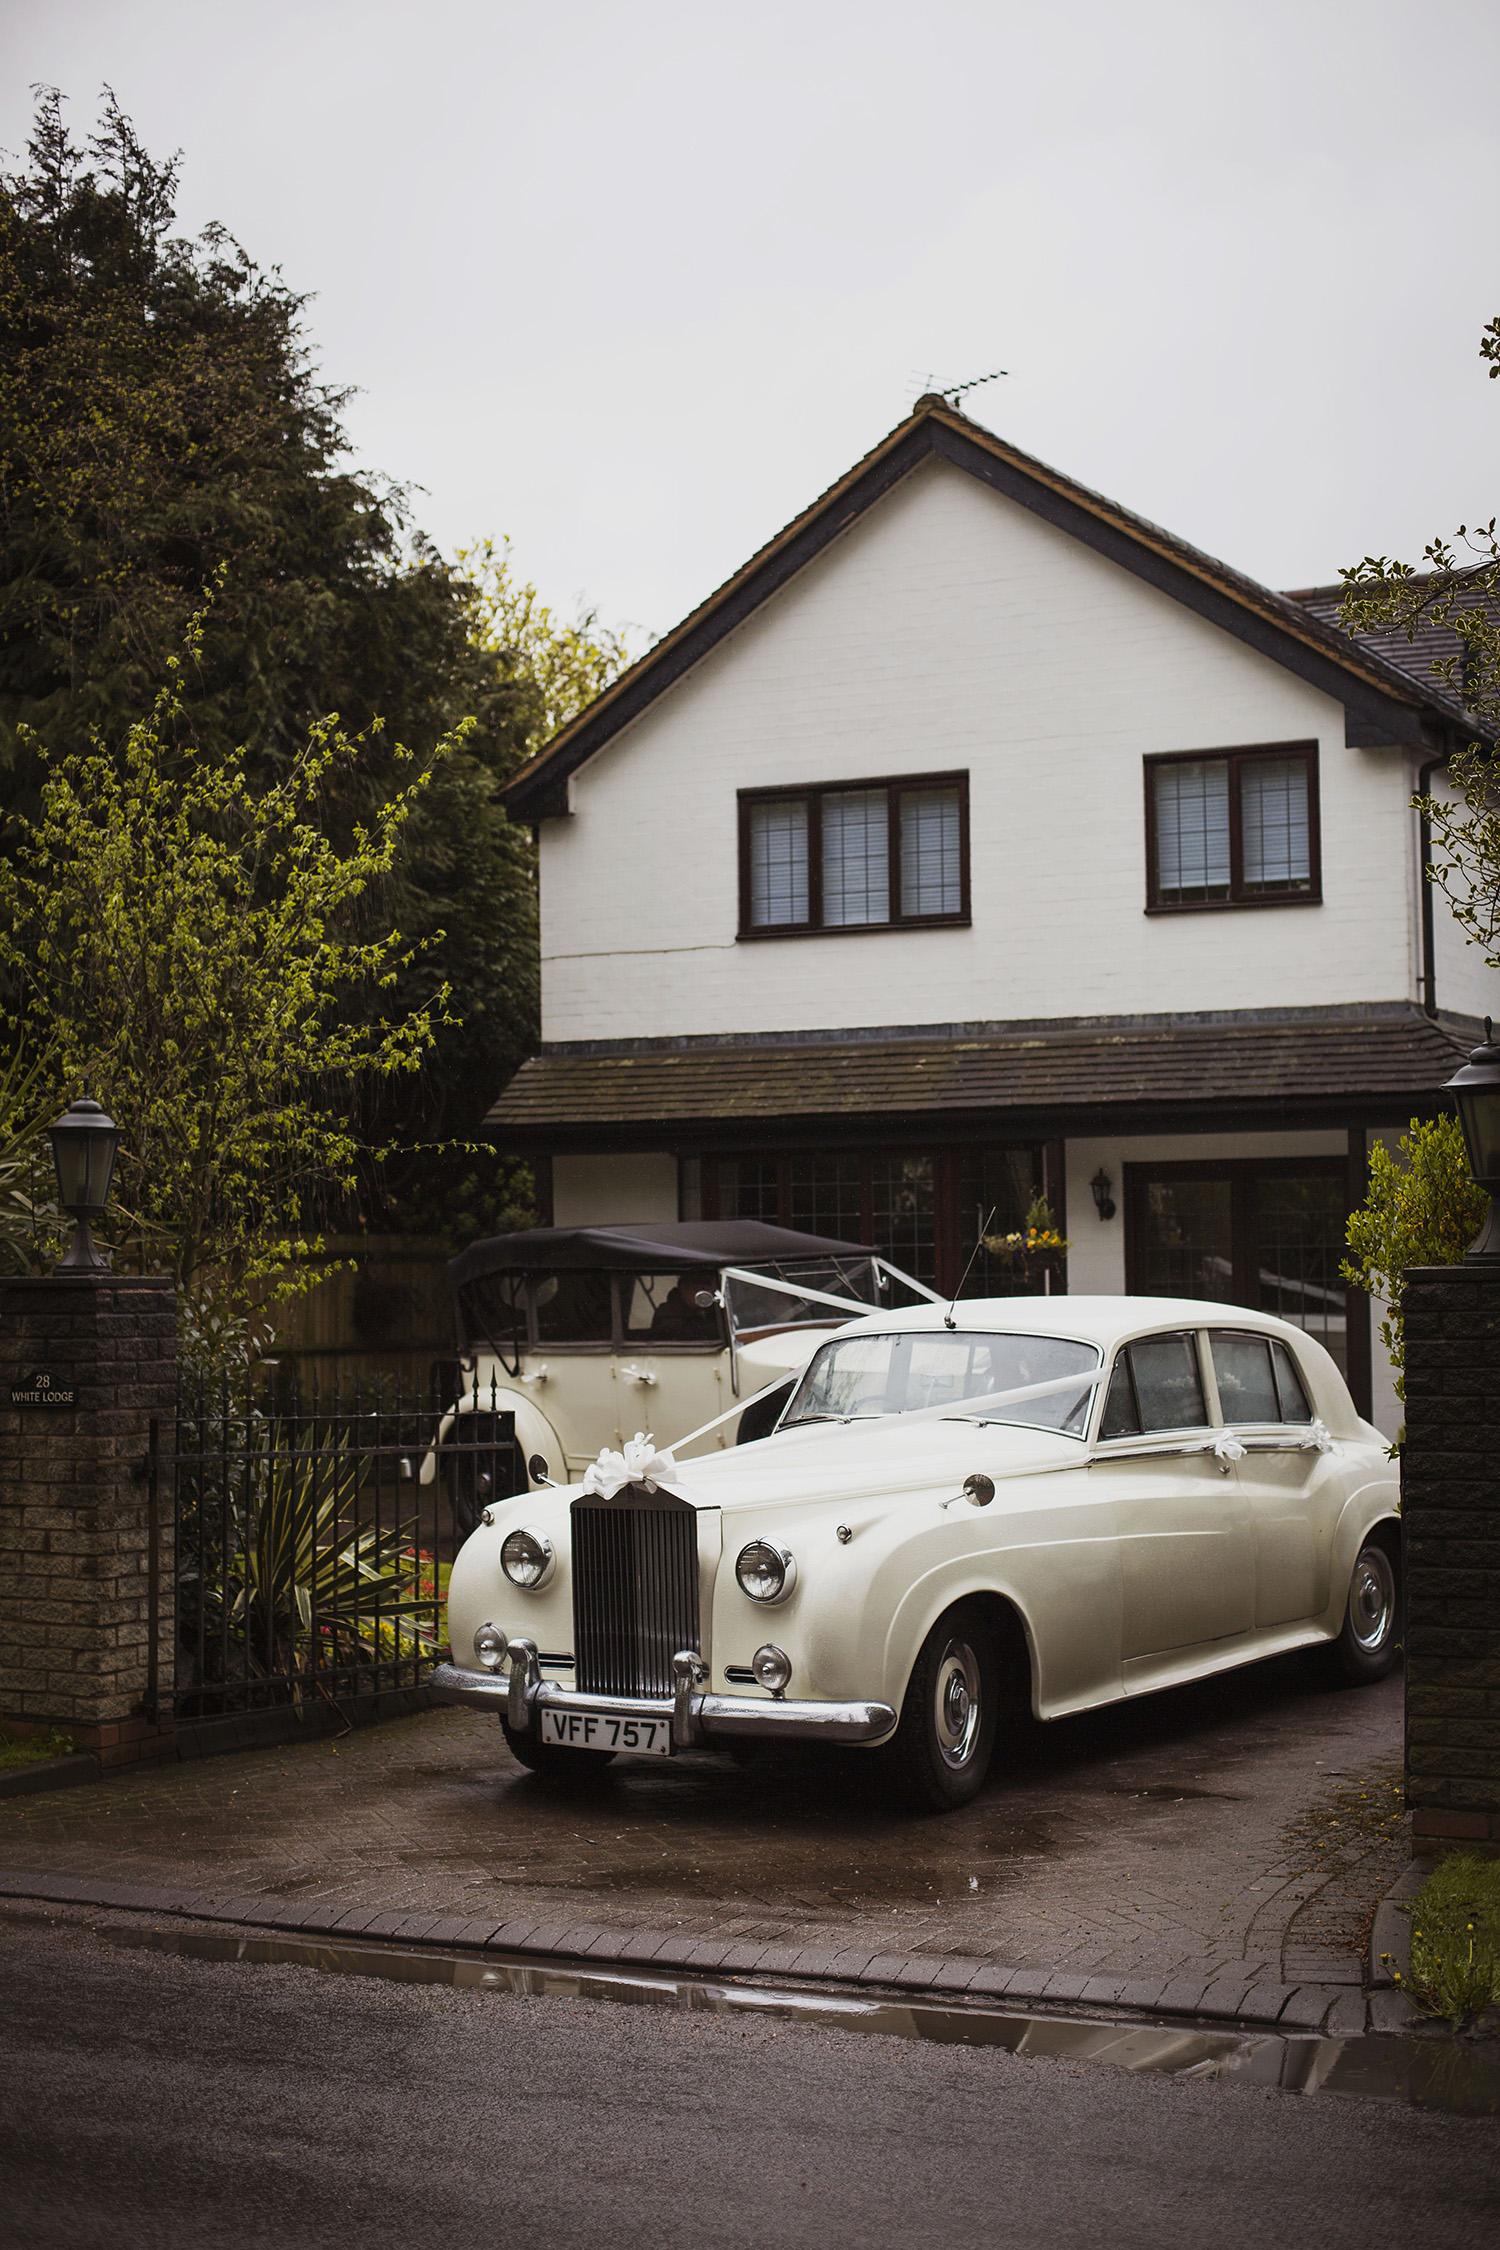 wedding car at diy wedding in midlands